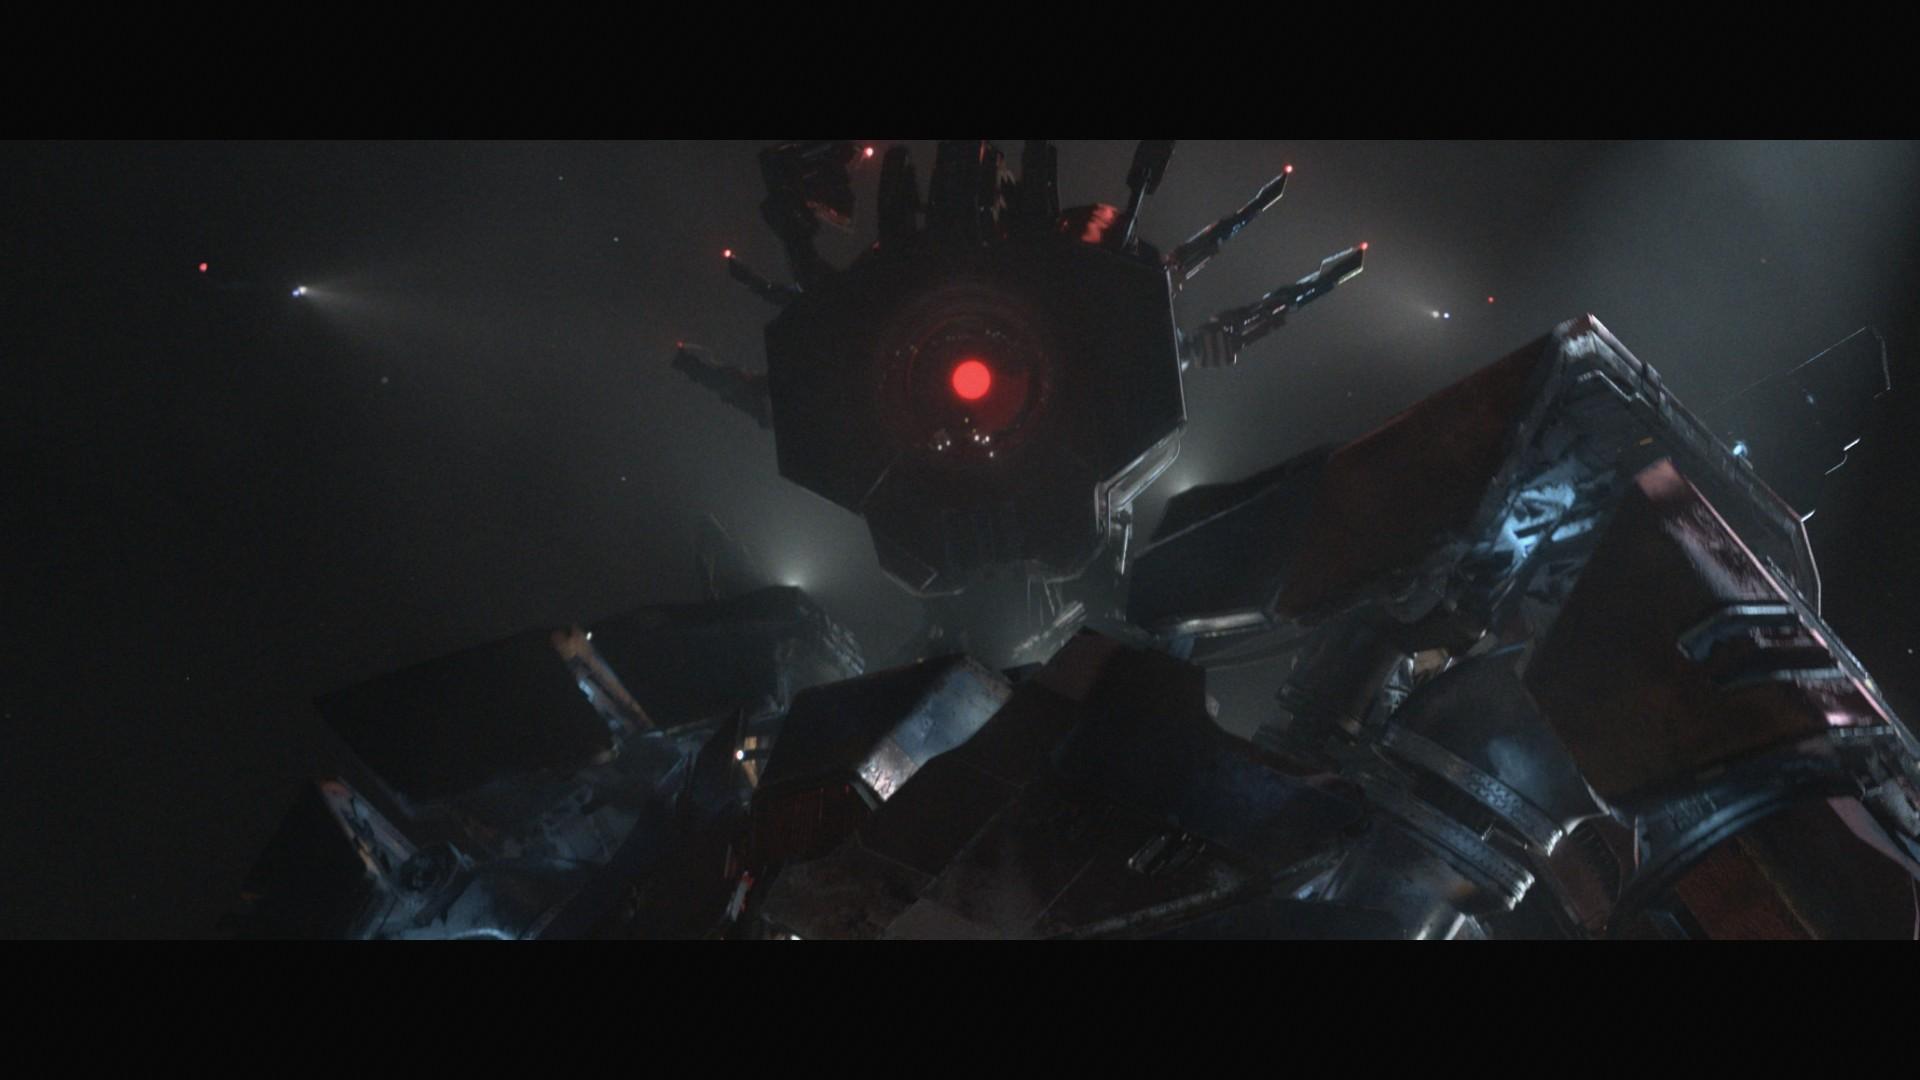 Colossal Giant Robot